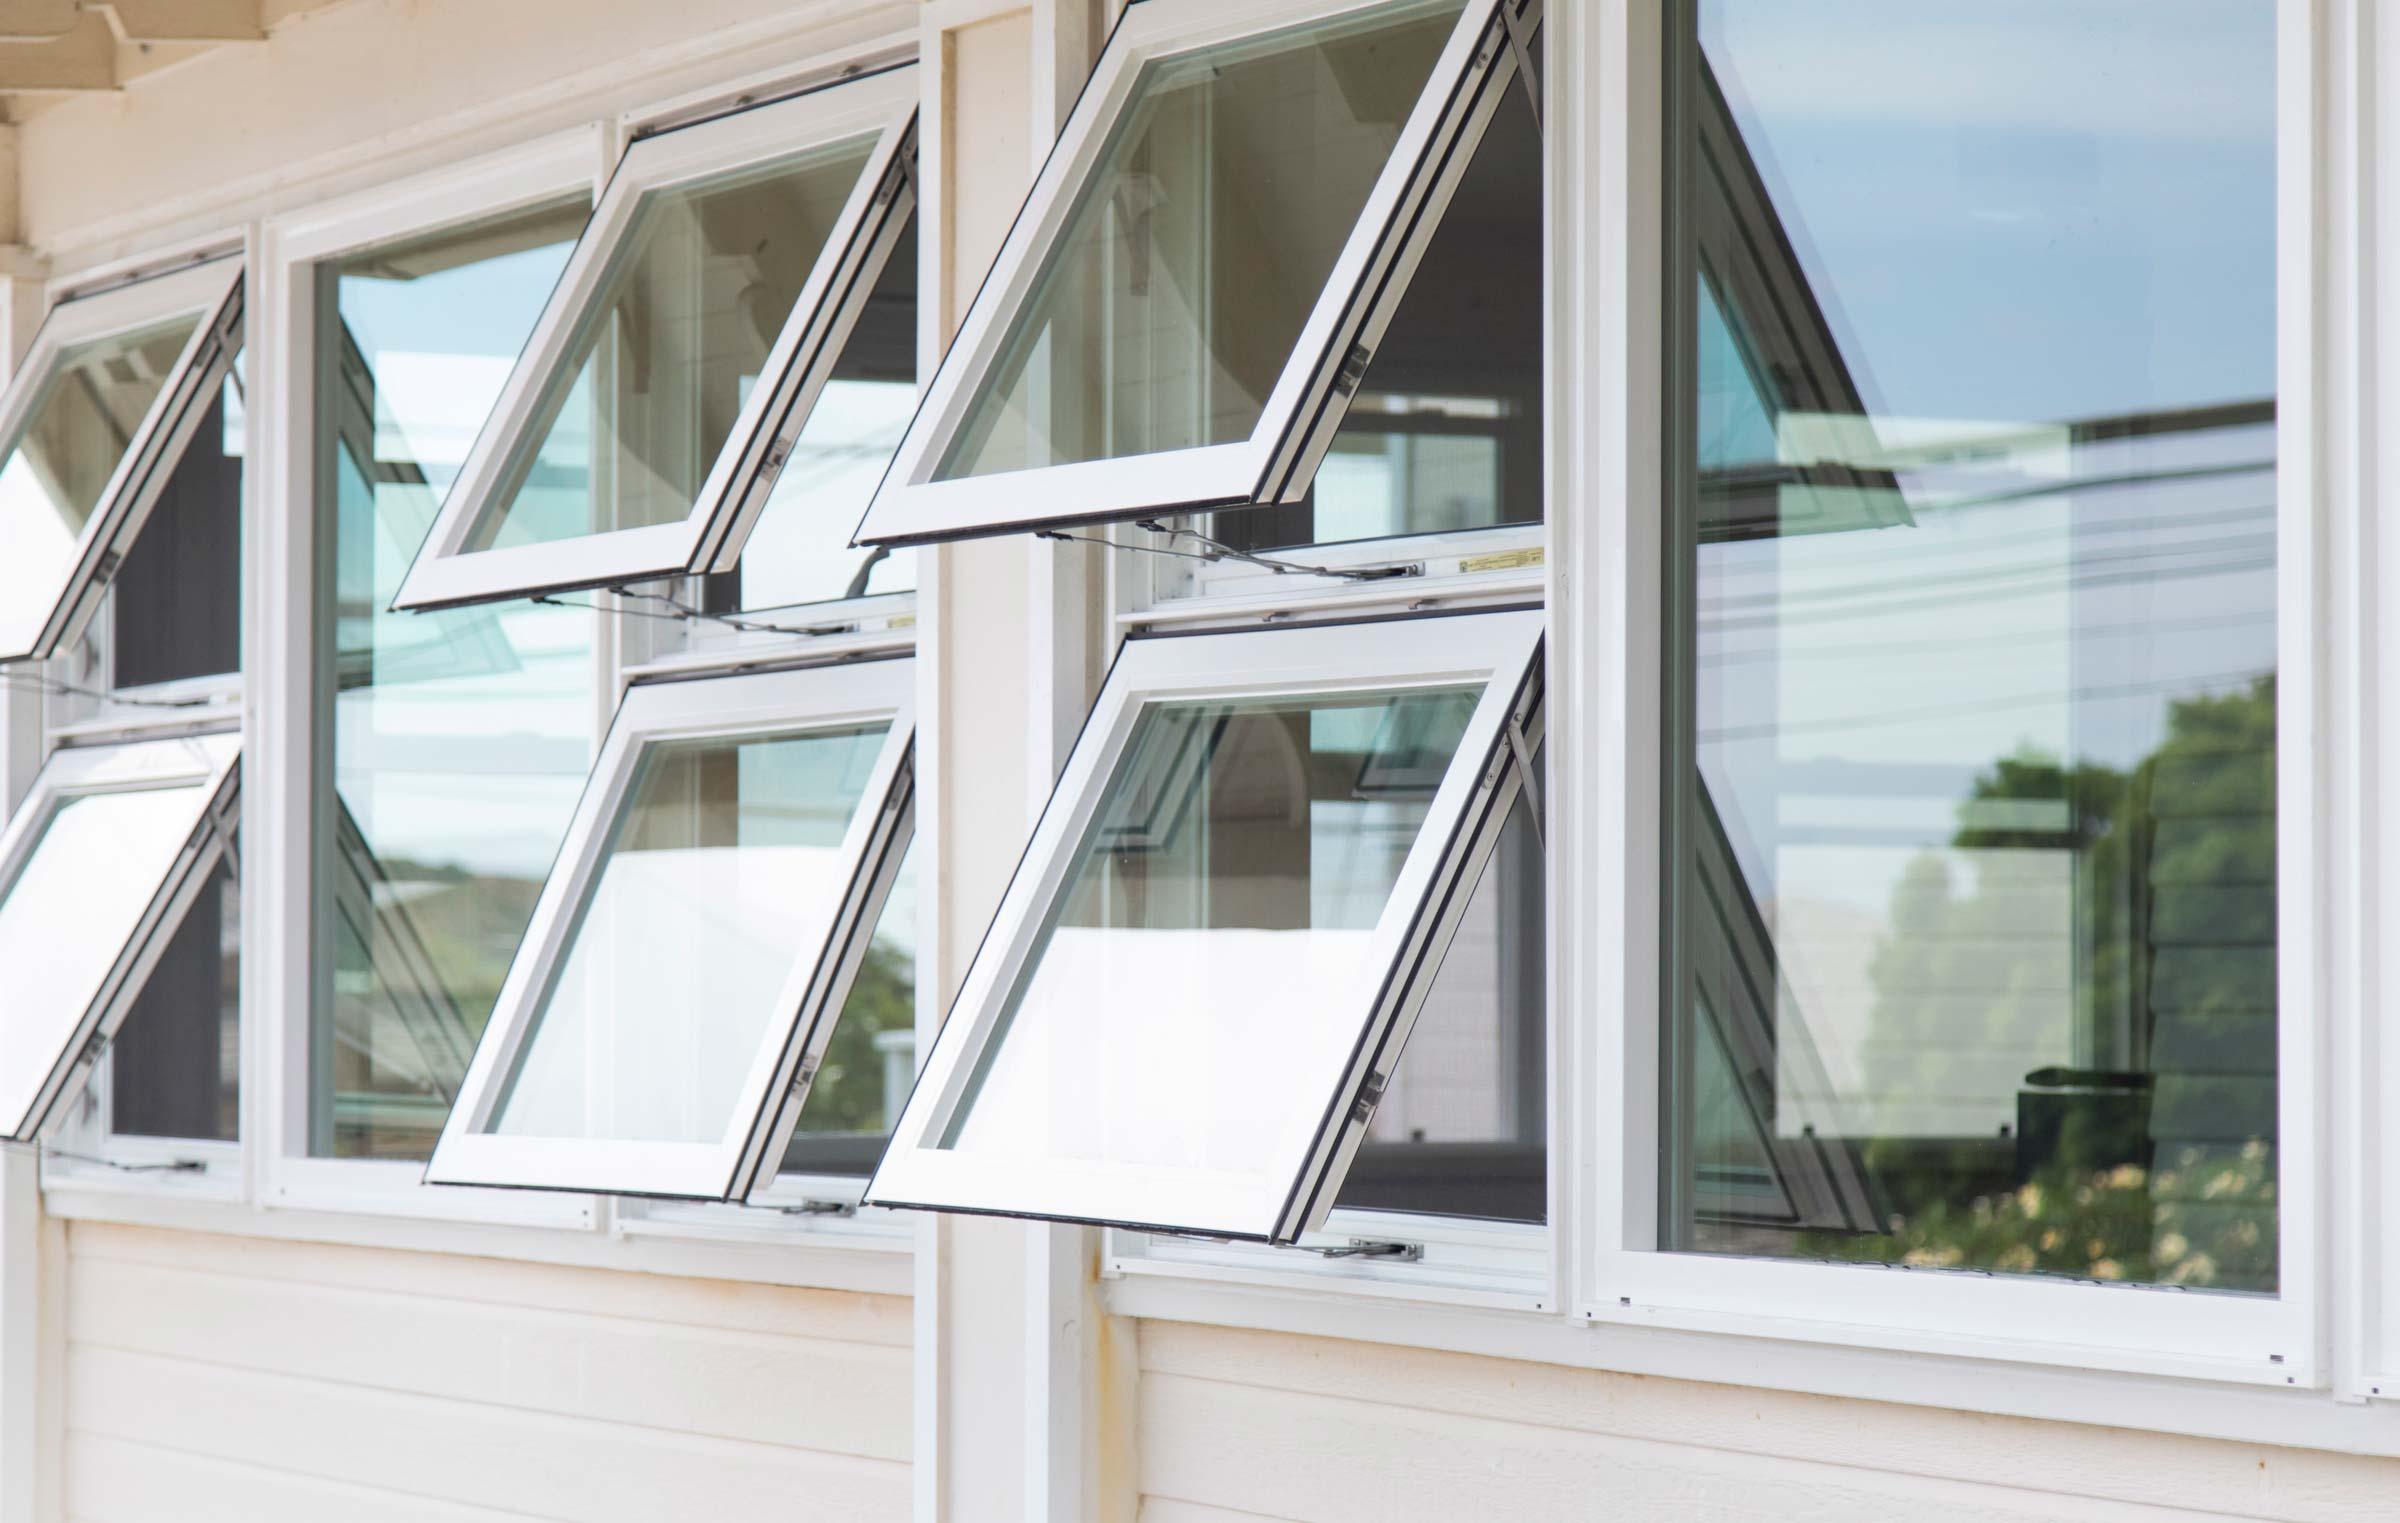 Vinyl Awning Windows from Island Windows and Doors